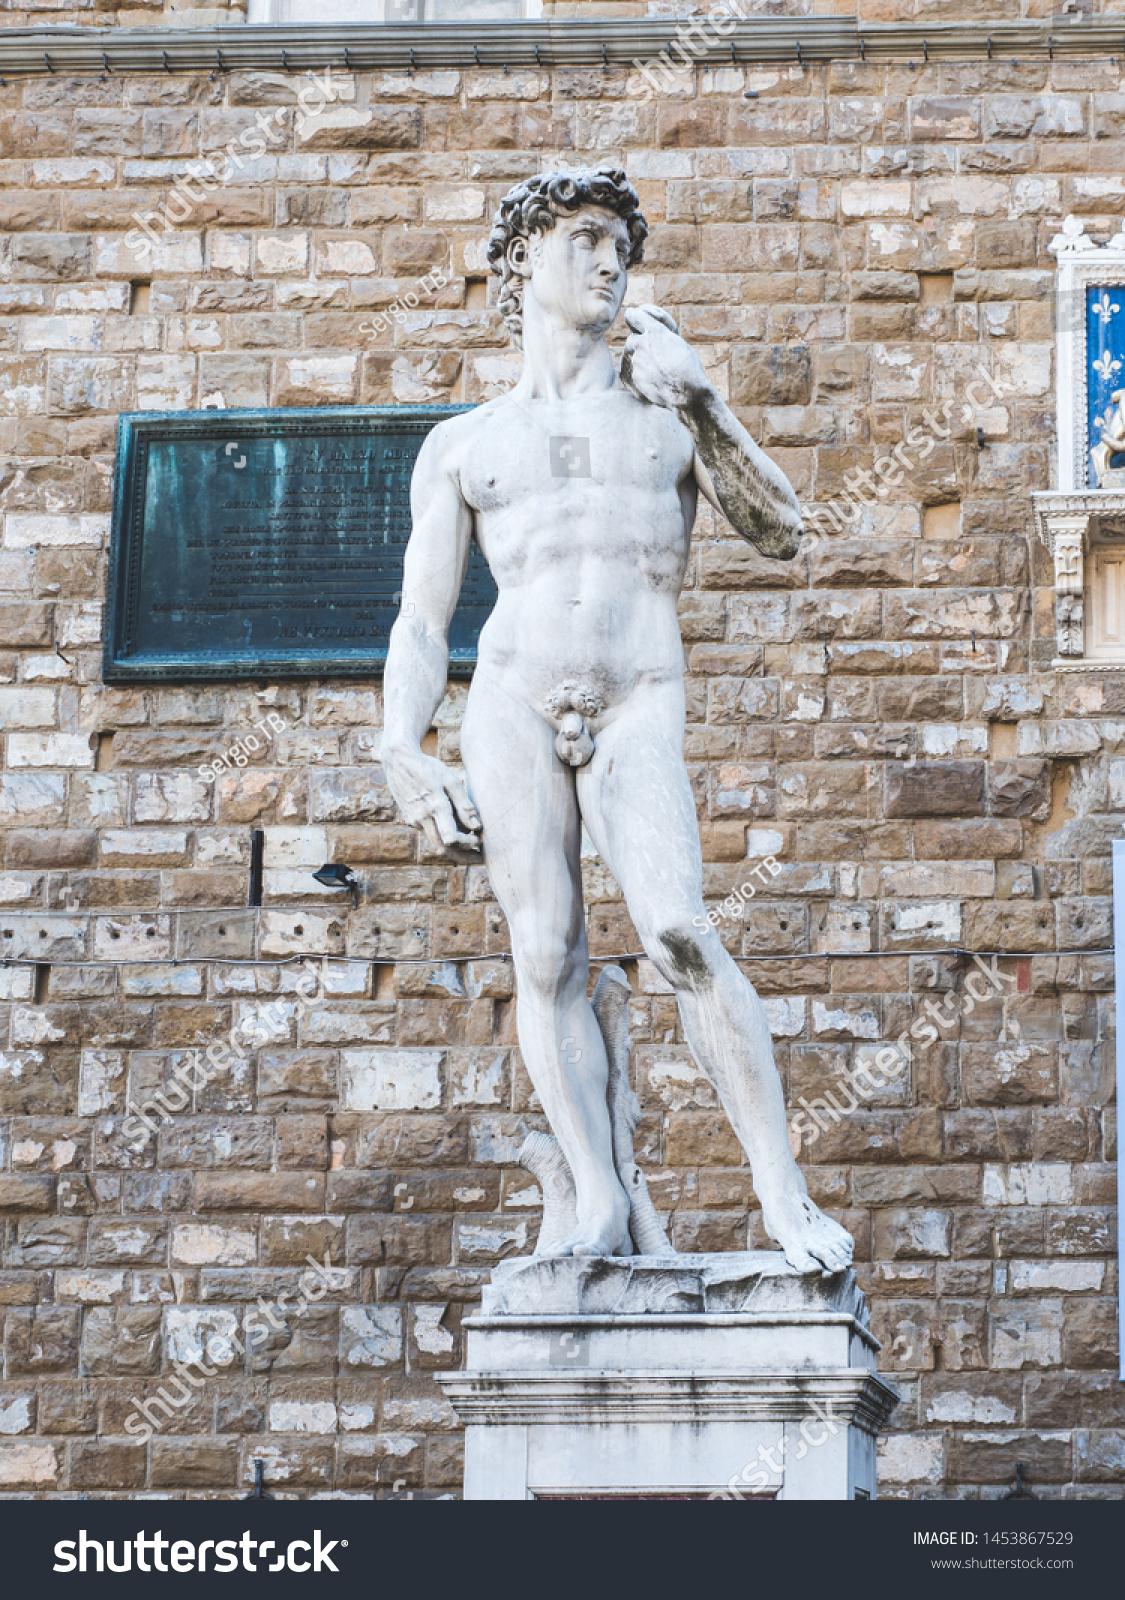 12.5 Inch Cold Cast Resin Renaissance Statue of Michelangelo/'s David